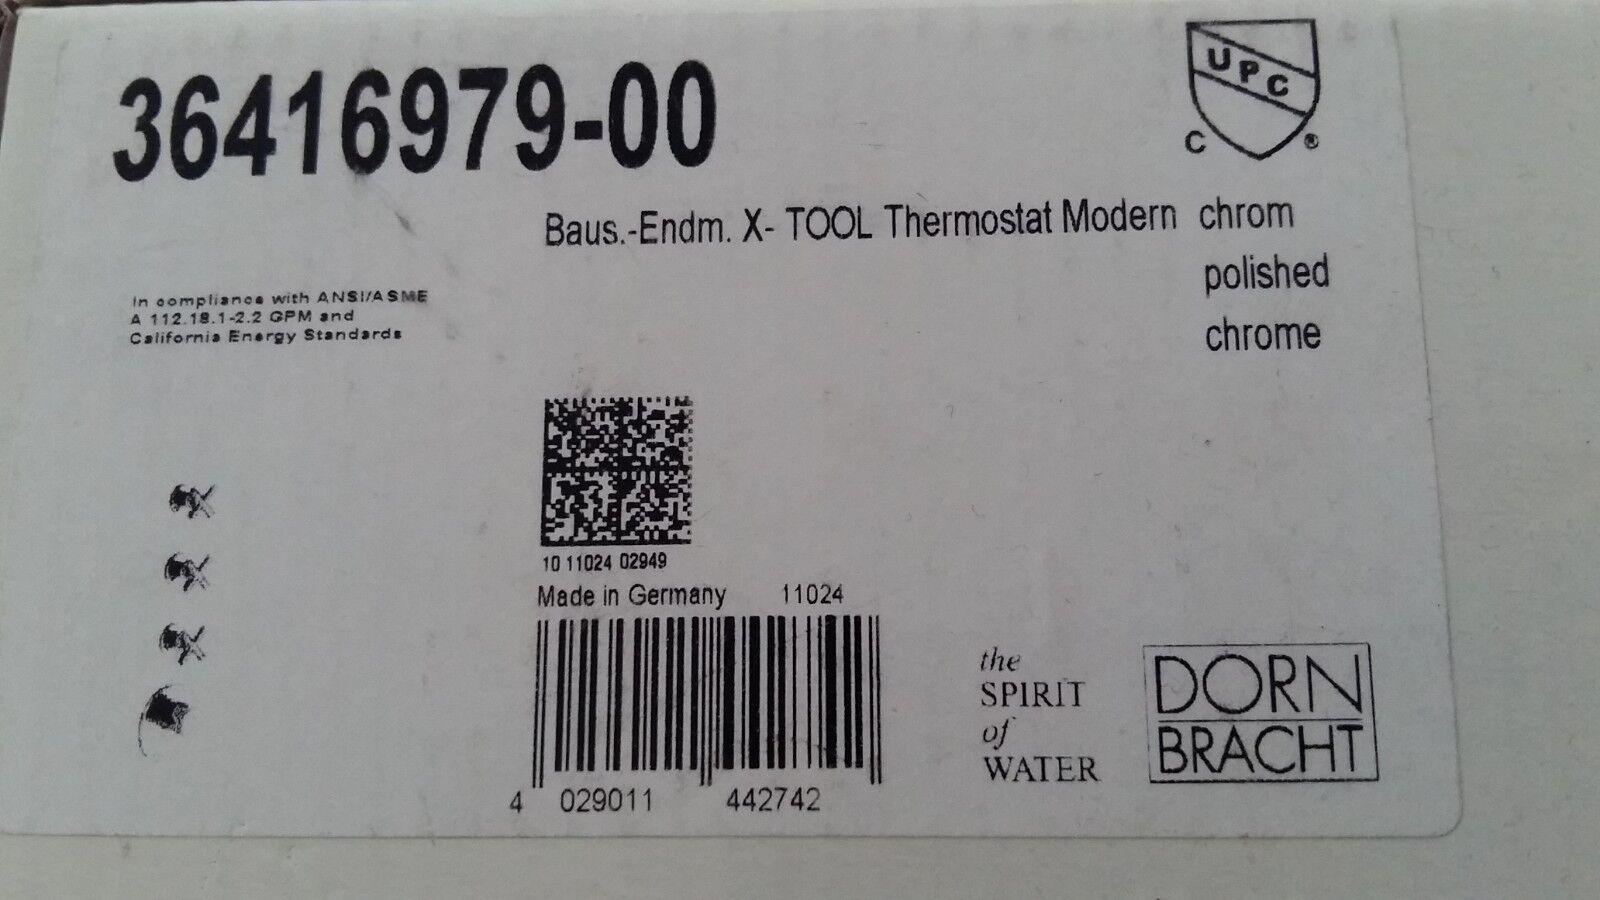 Dornbracht xTool UnterputzThermostat Modern Bausatz Endmontage chrom 36416979-00